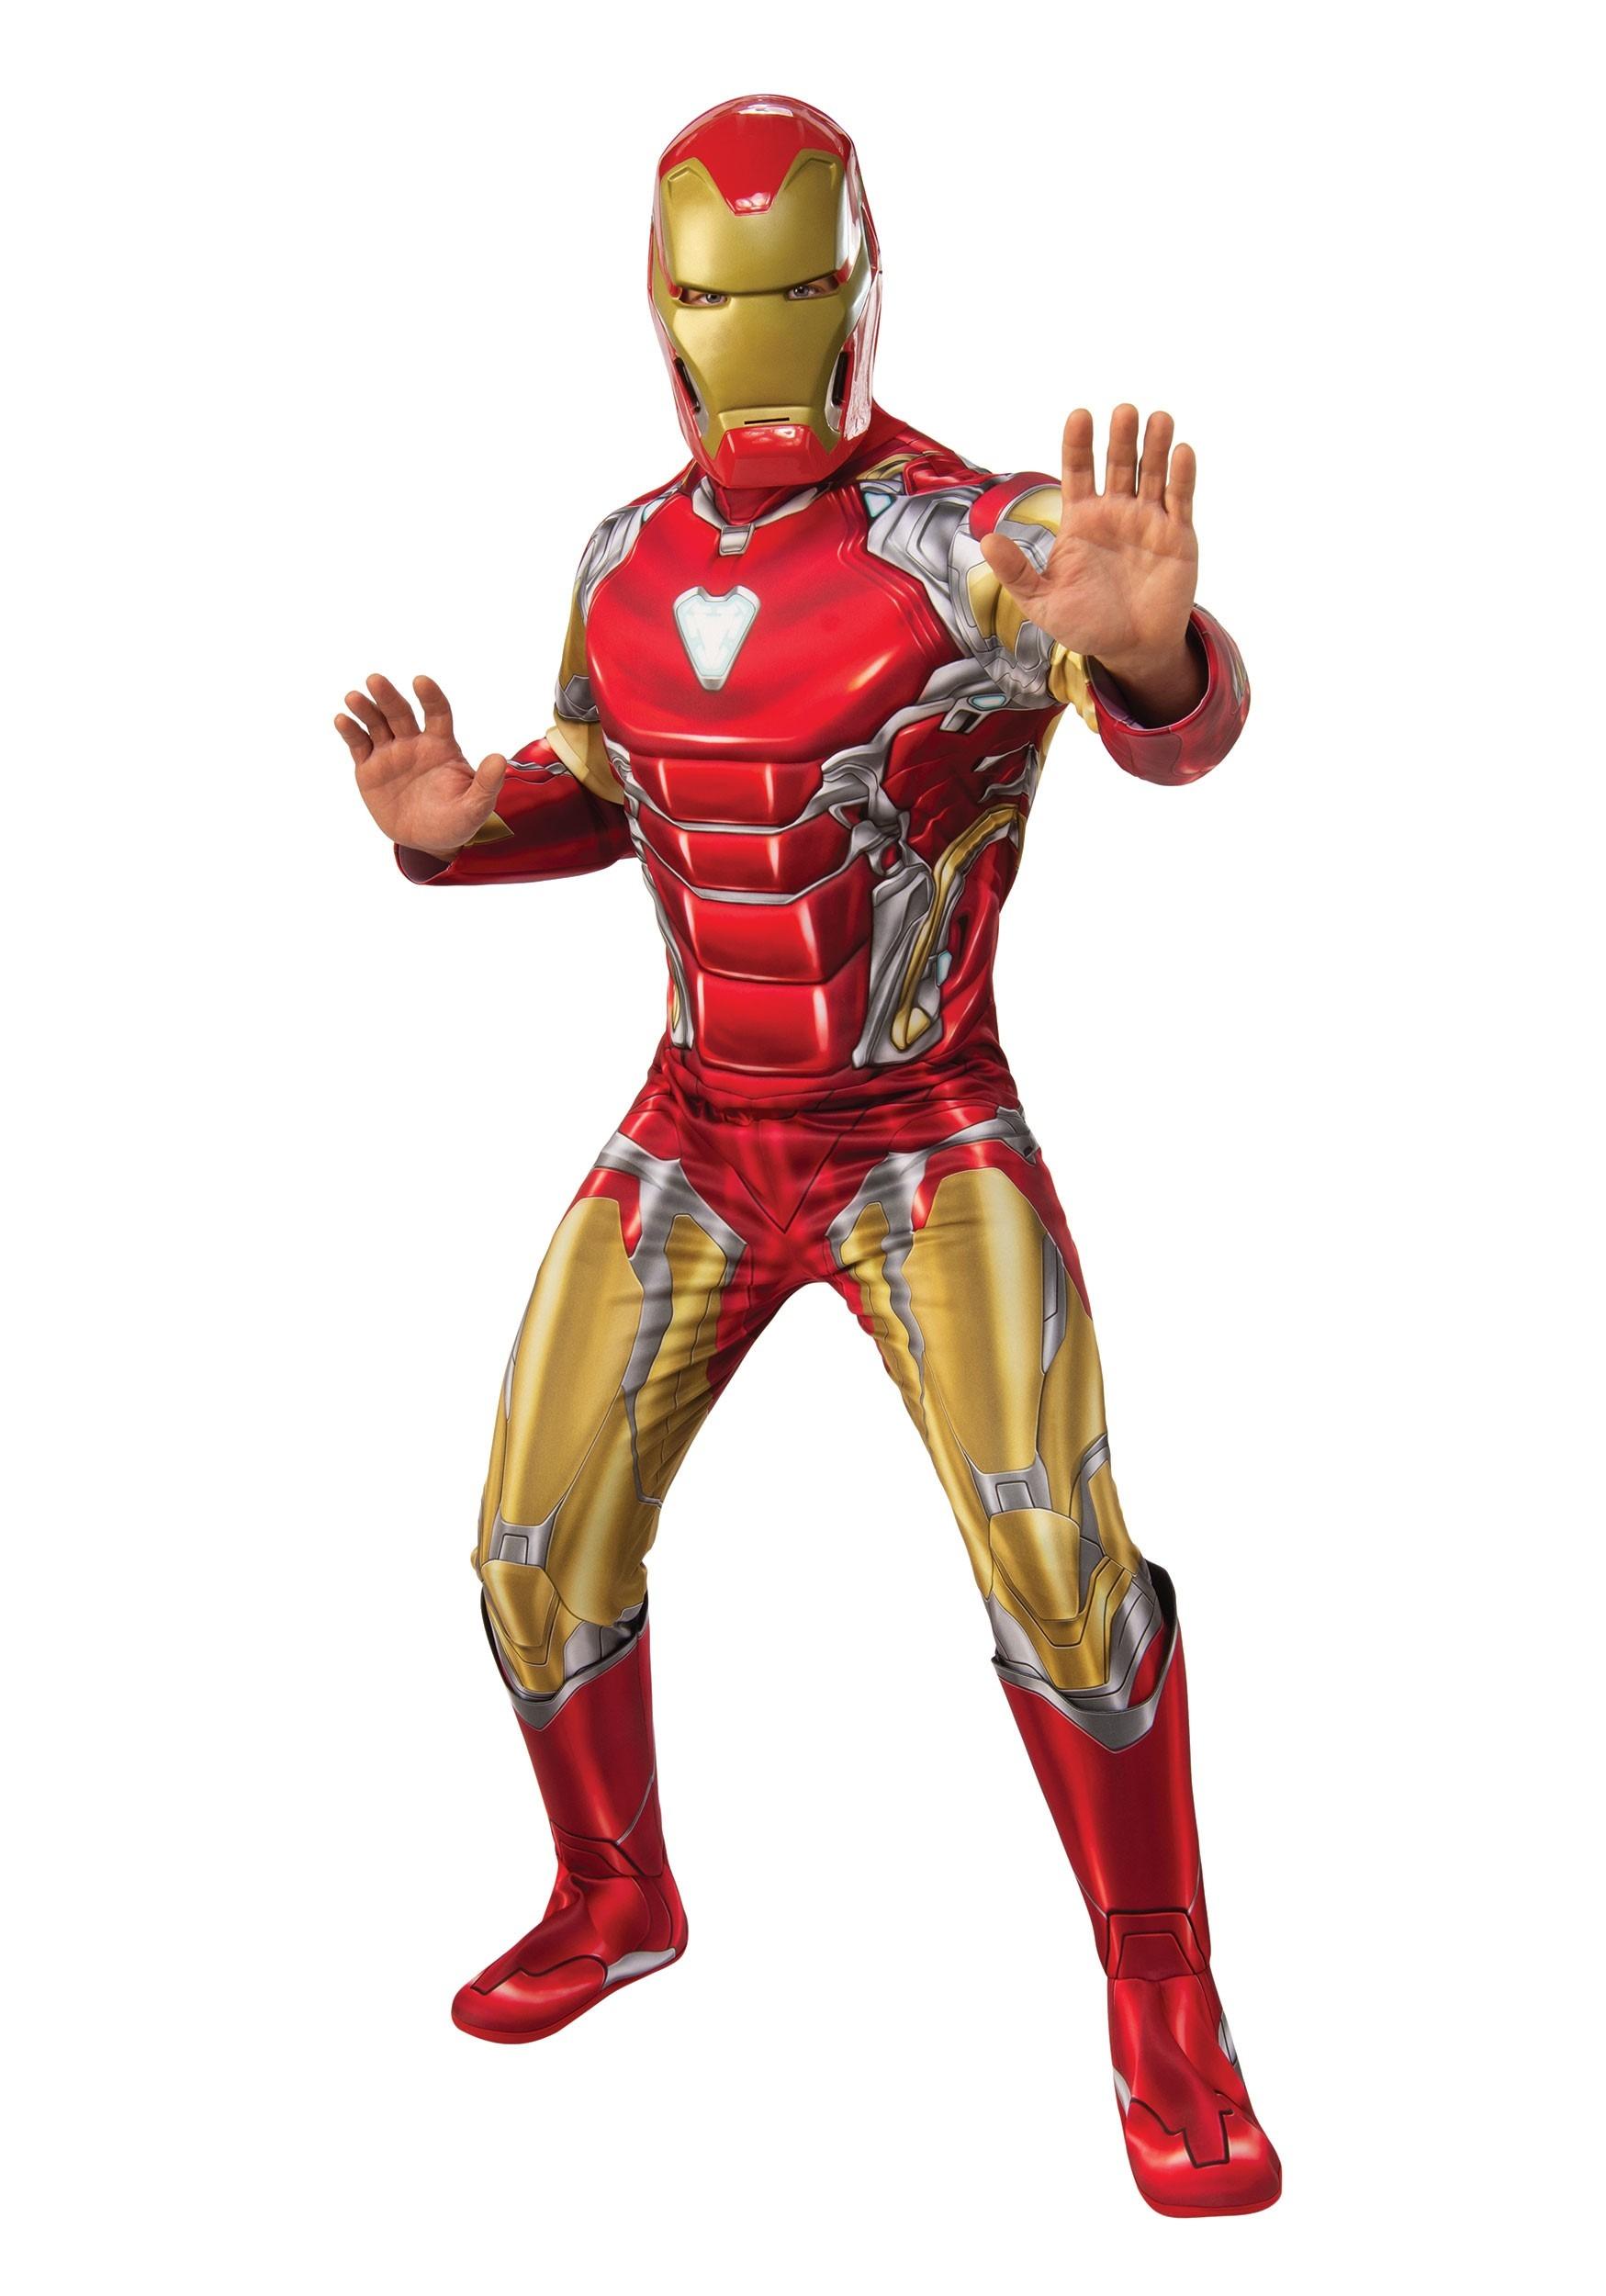 Iron Man Avengers Endgame Adult Deluxe Costume